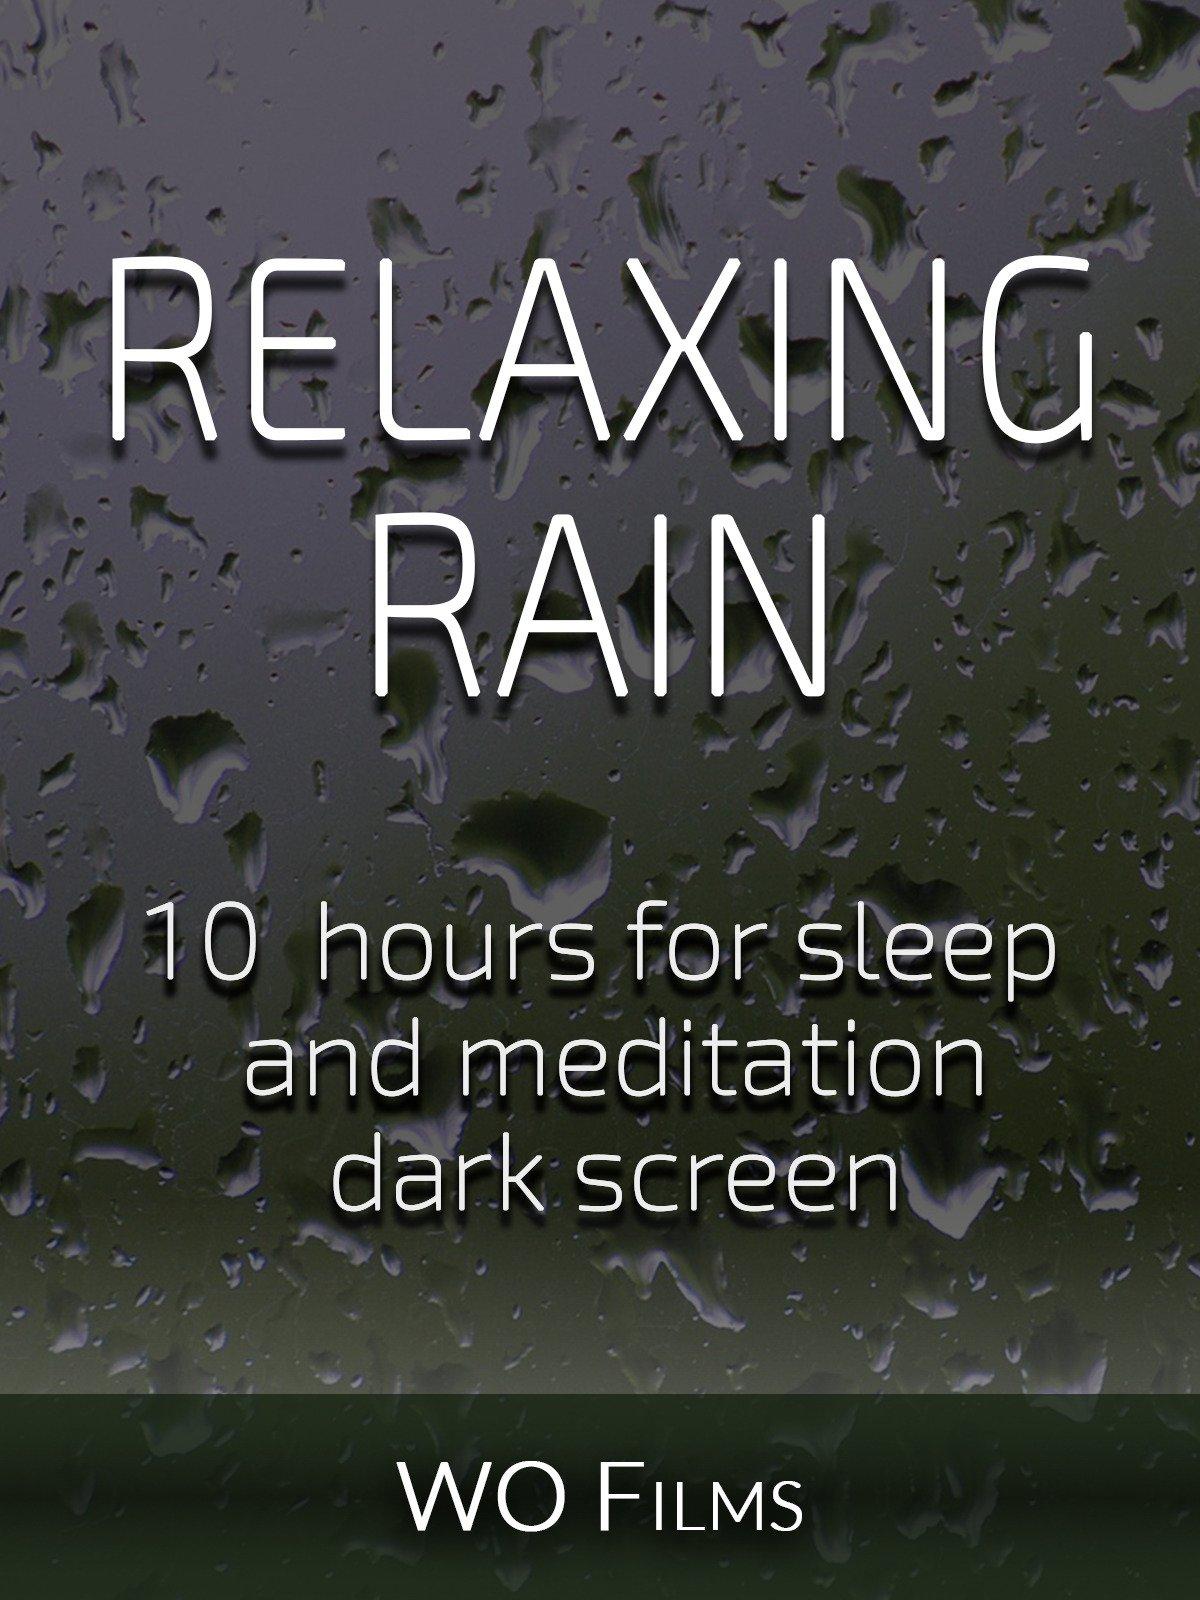 Relaxing rain, 10 hours for Sleep and Meditation, dark screen